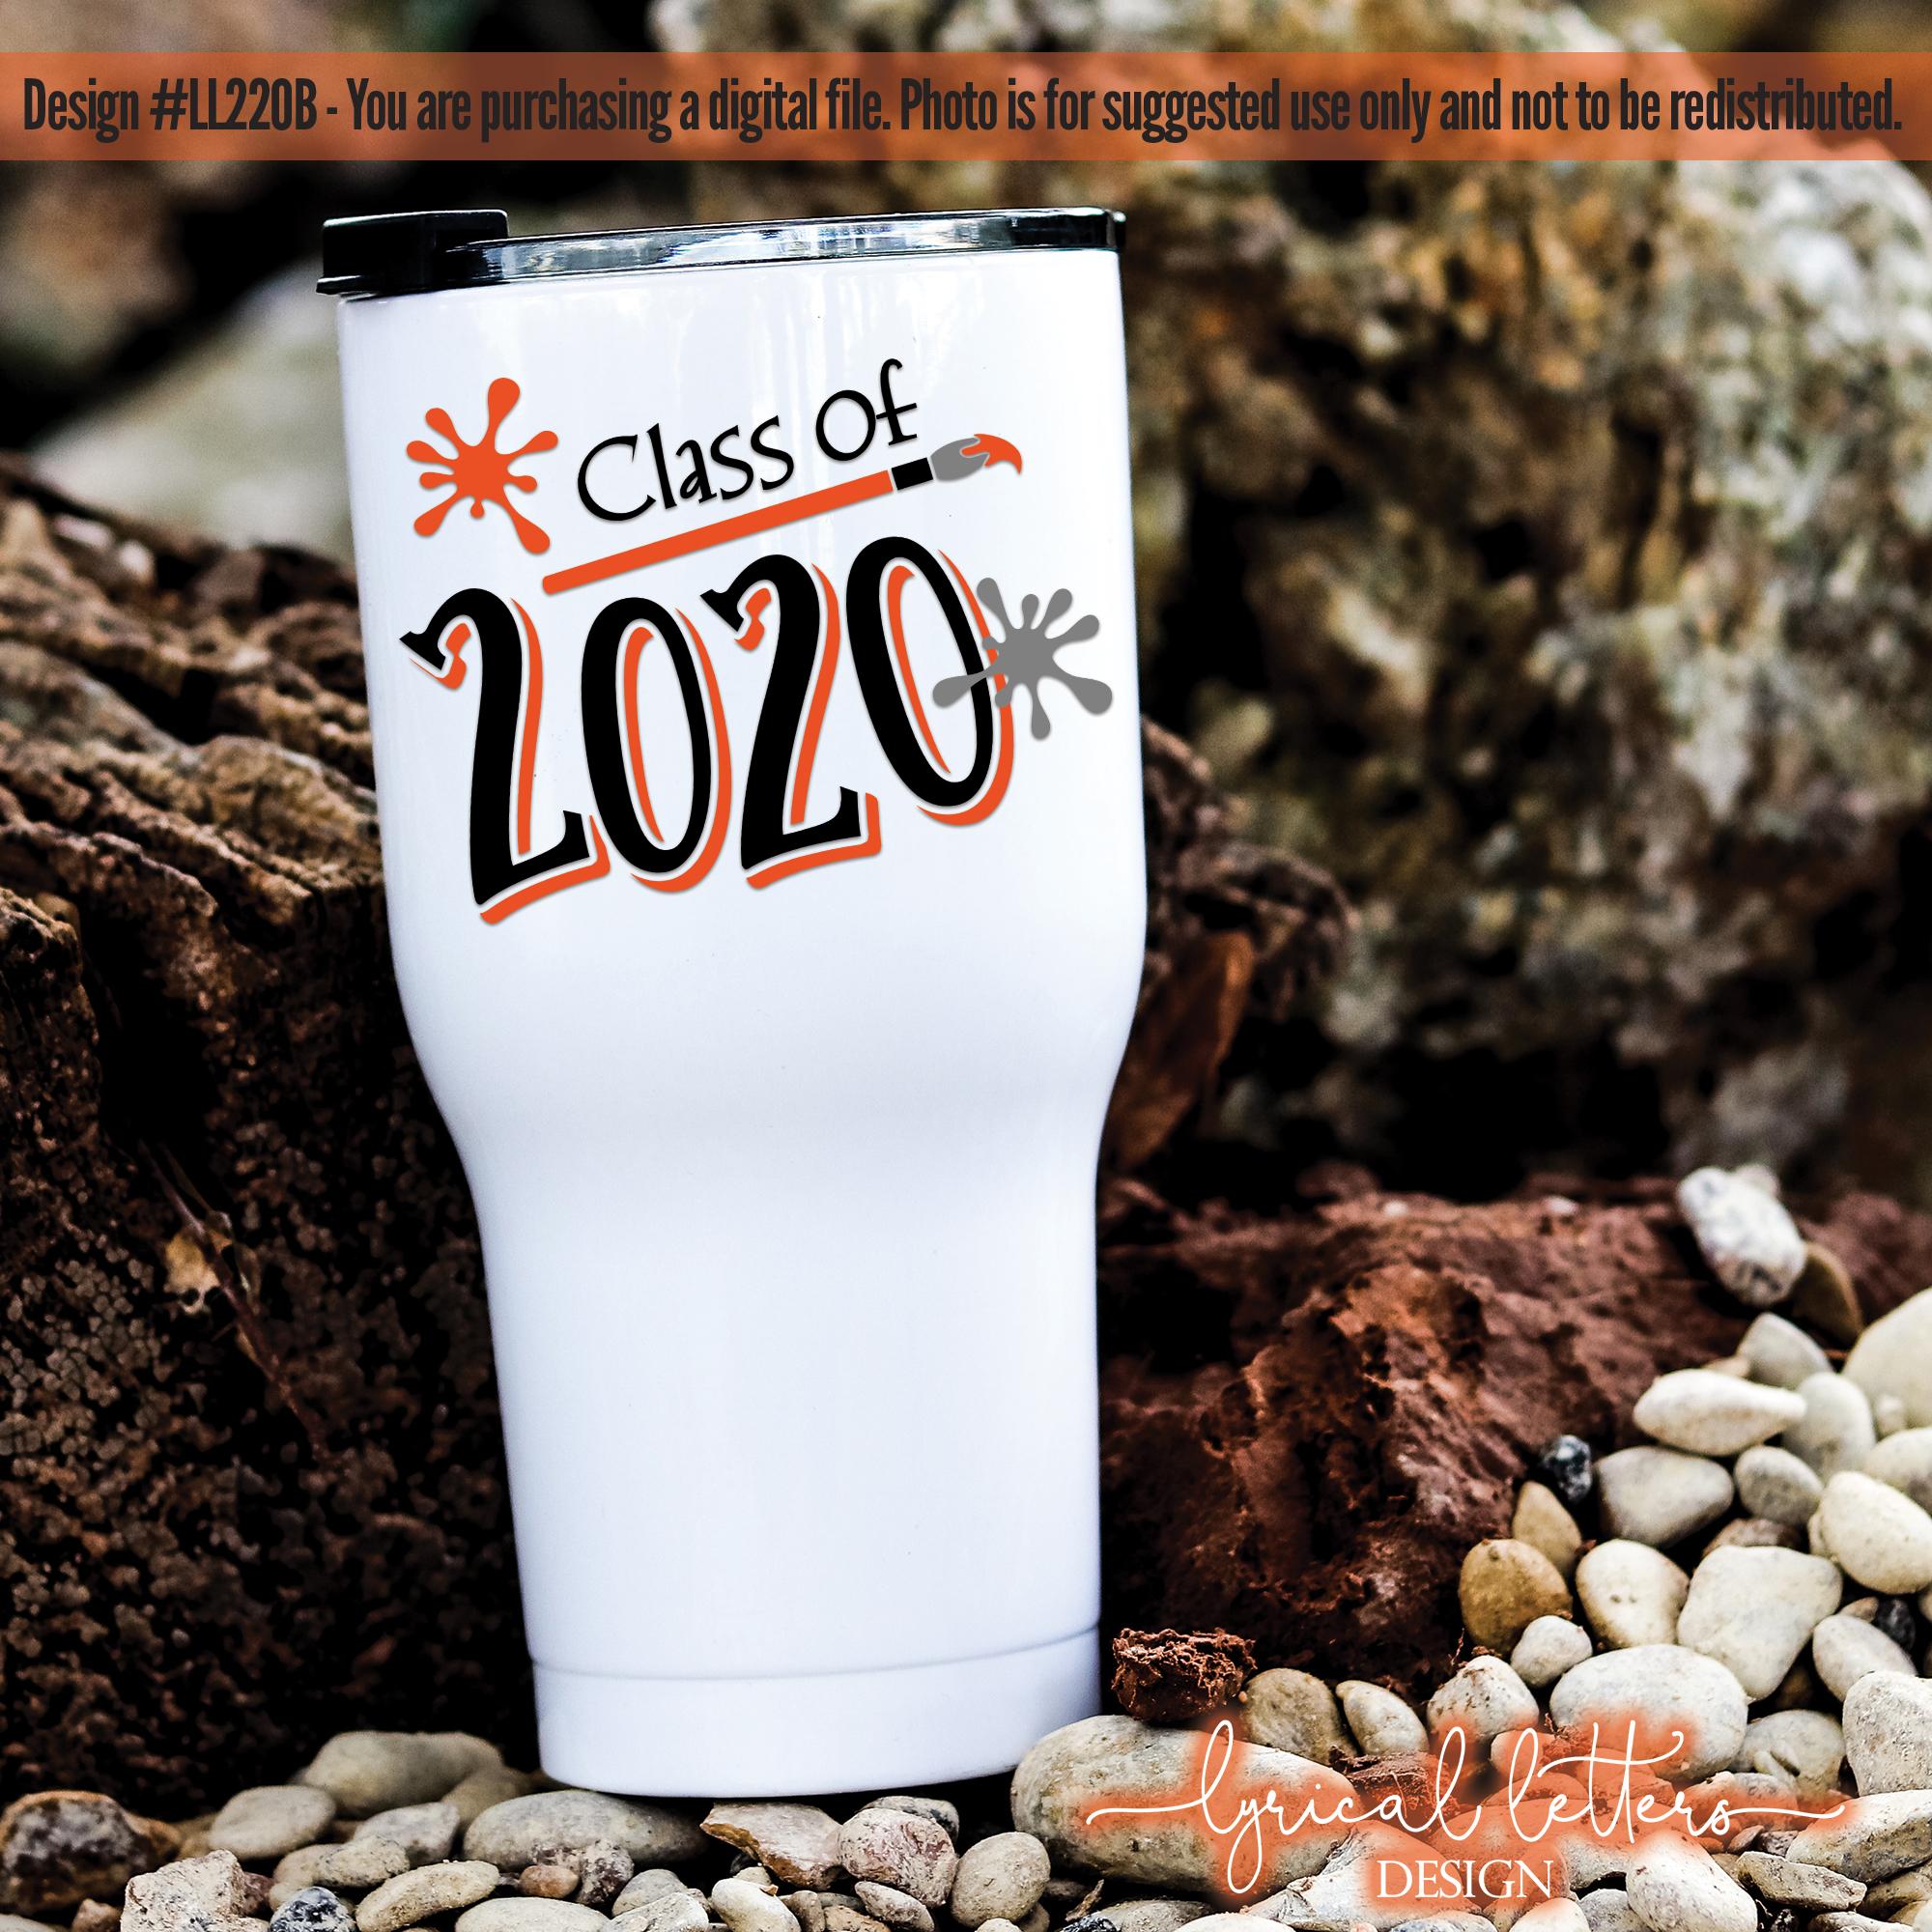 Class of 2020 Graduation Artist Art Paint Brush SVG LL220B example image 2